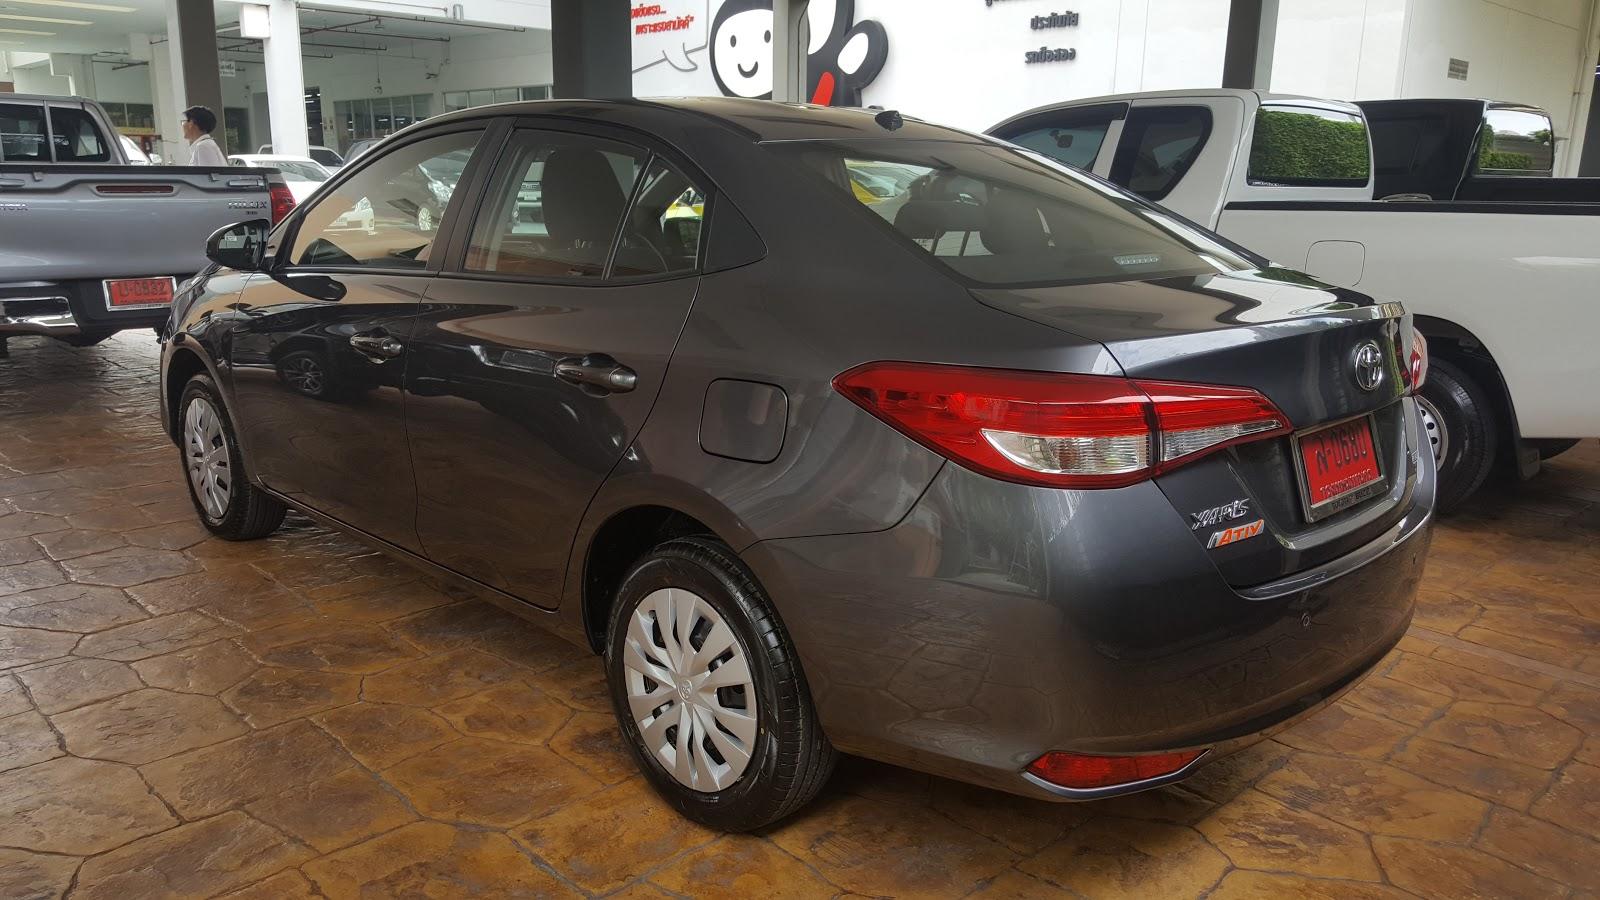 Toyota Yaris Ativ Trd Aksesoris Grand New Avanza 2018 บนทกทวไป รวว J